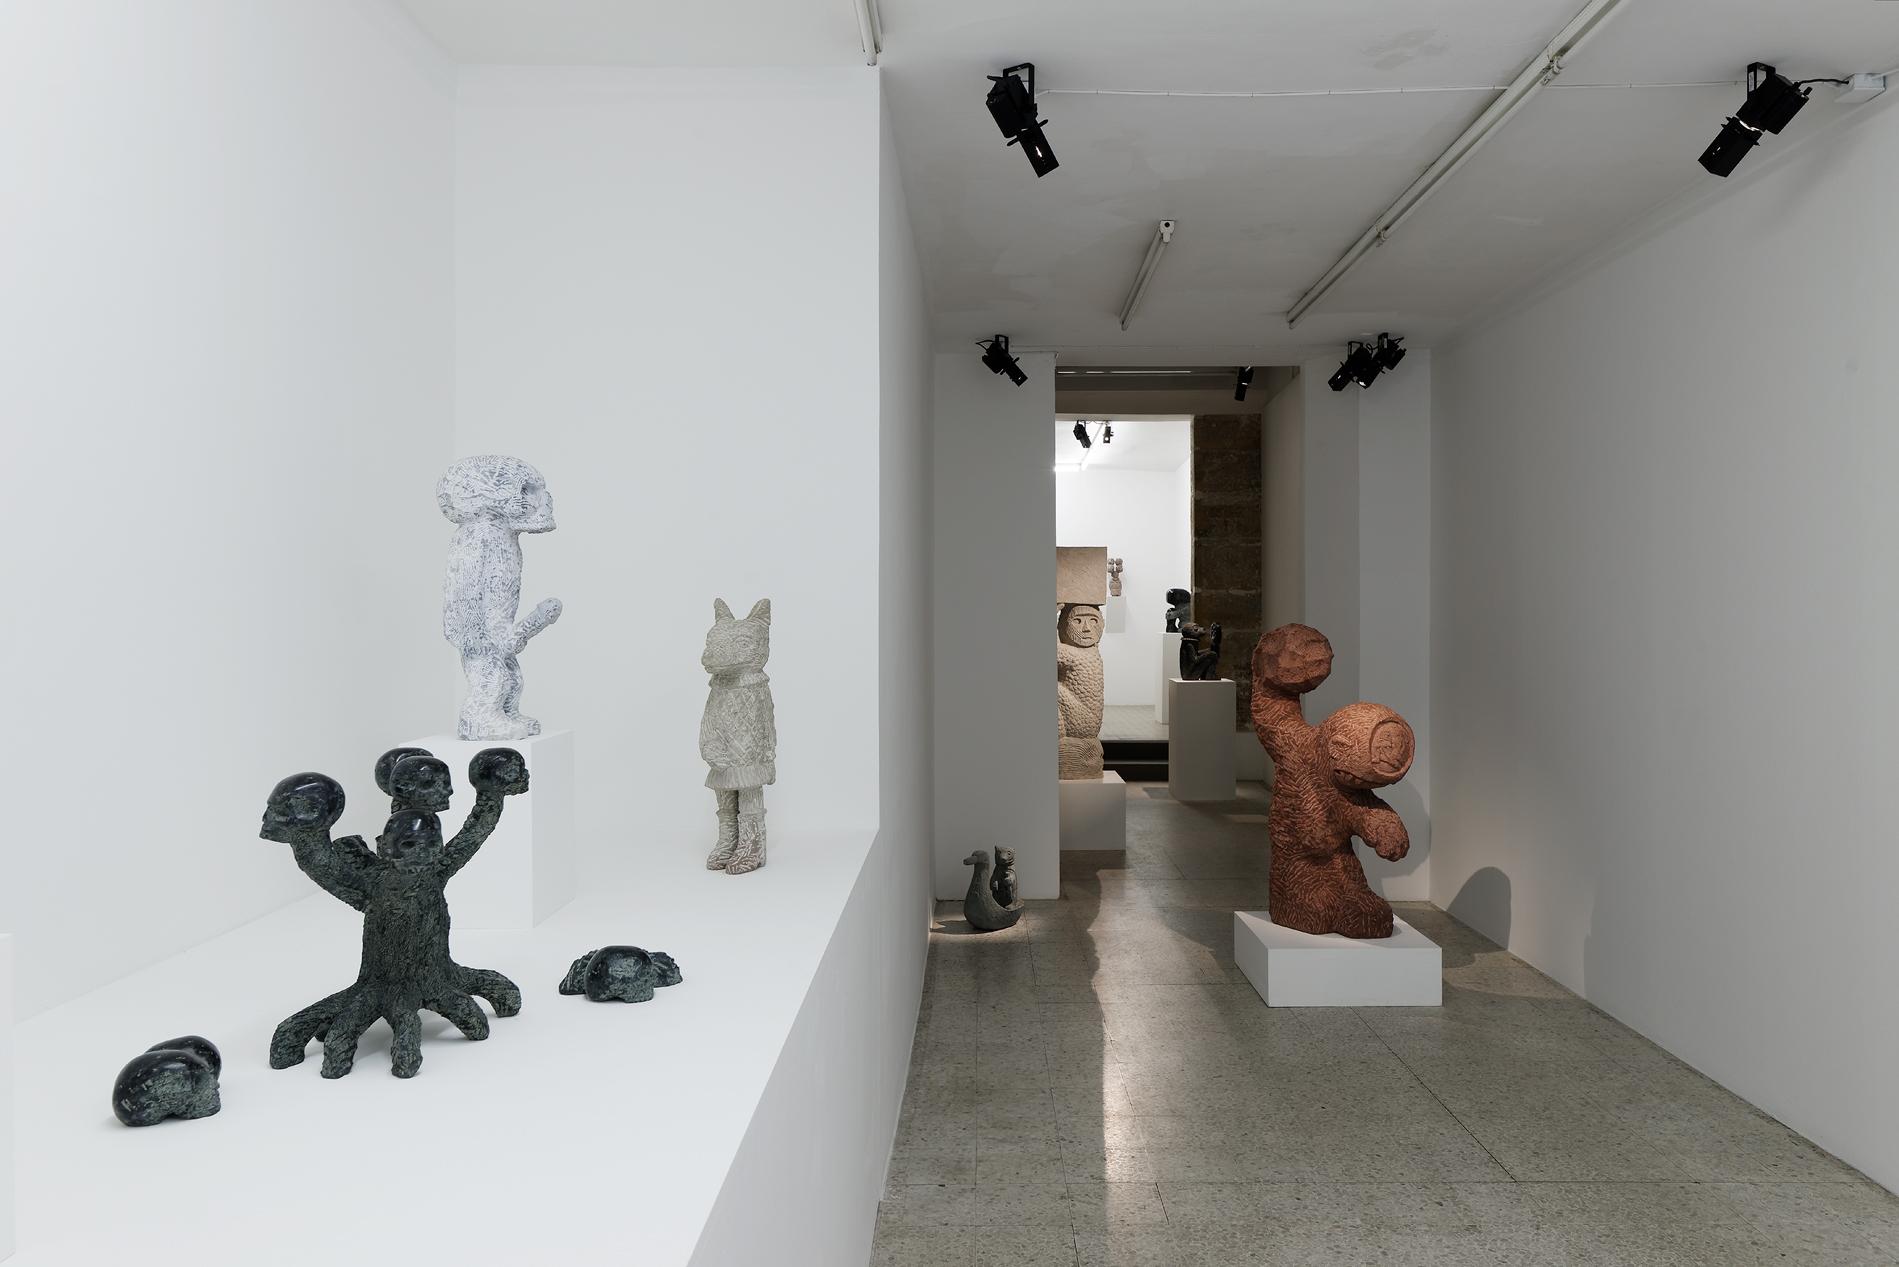 Stefan Rinck - Metaphysical Casino | Semiose | 13.4.17 - 3.6.17 | Paris